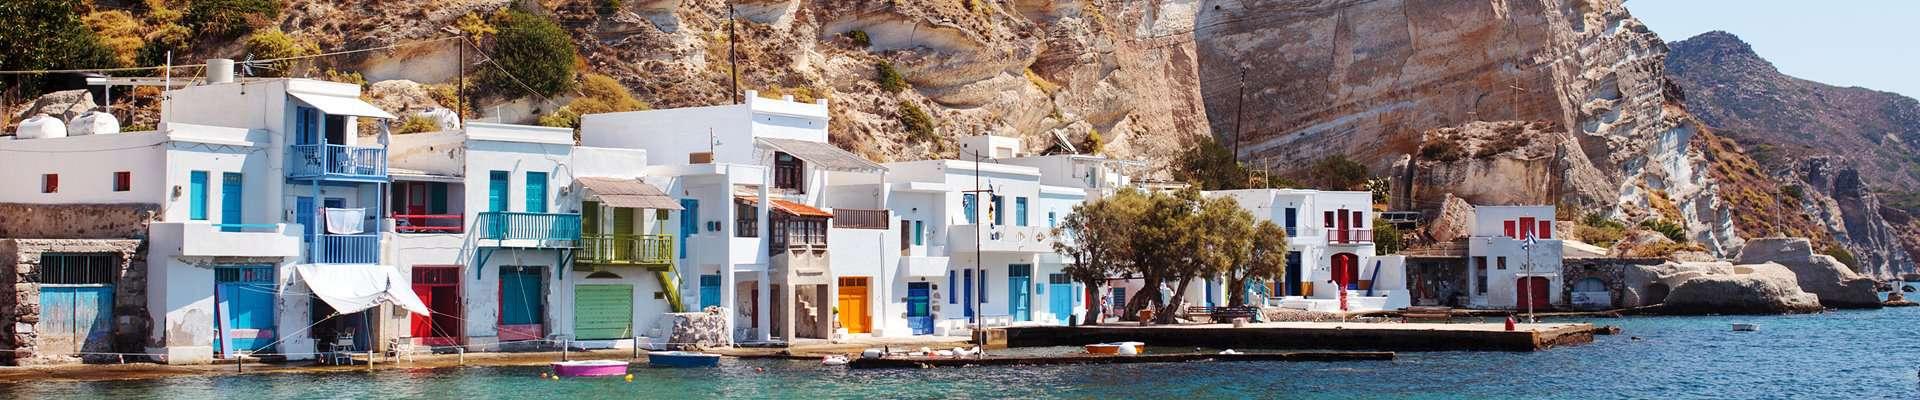 Colourful houses in the seaside village of Klima on Milos Island, Greece.